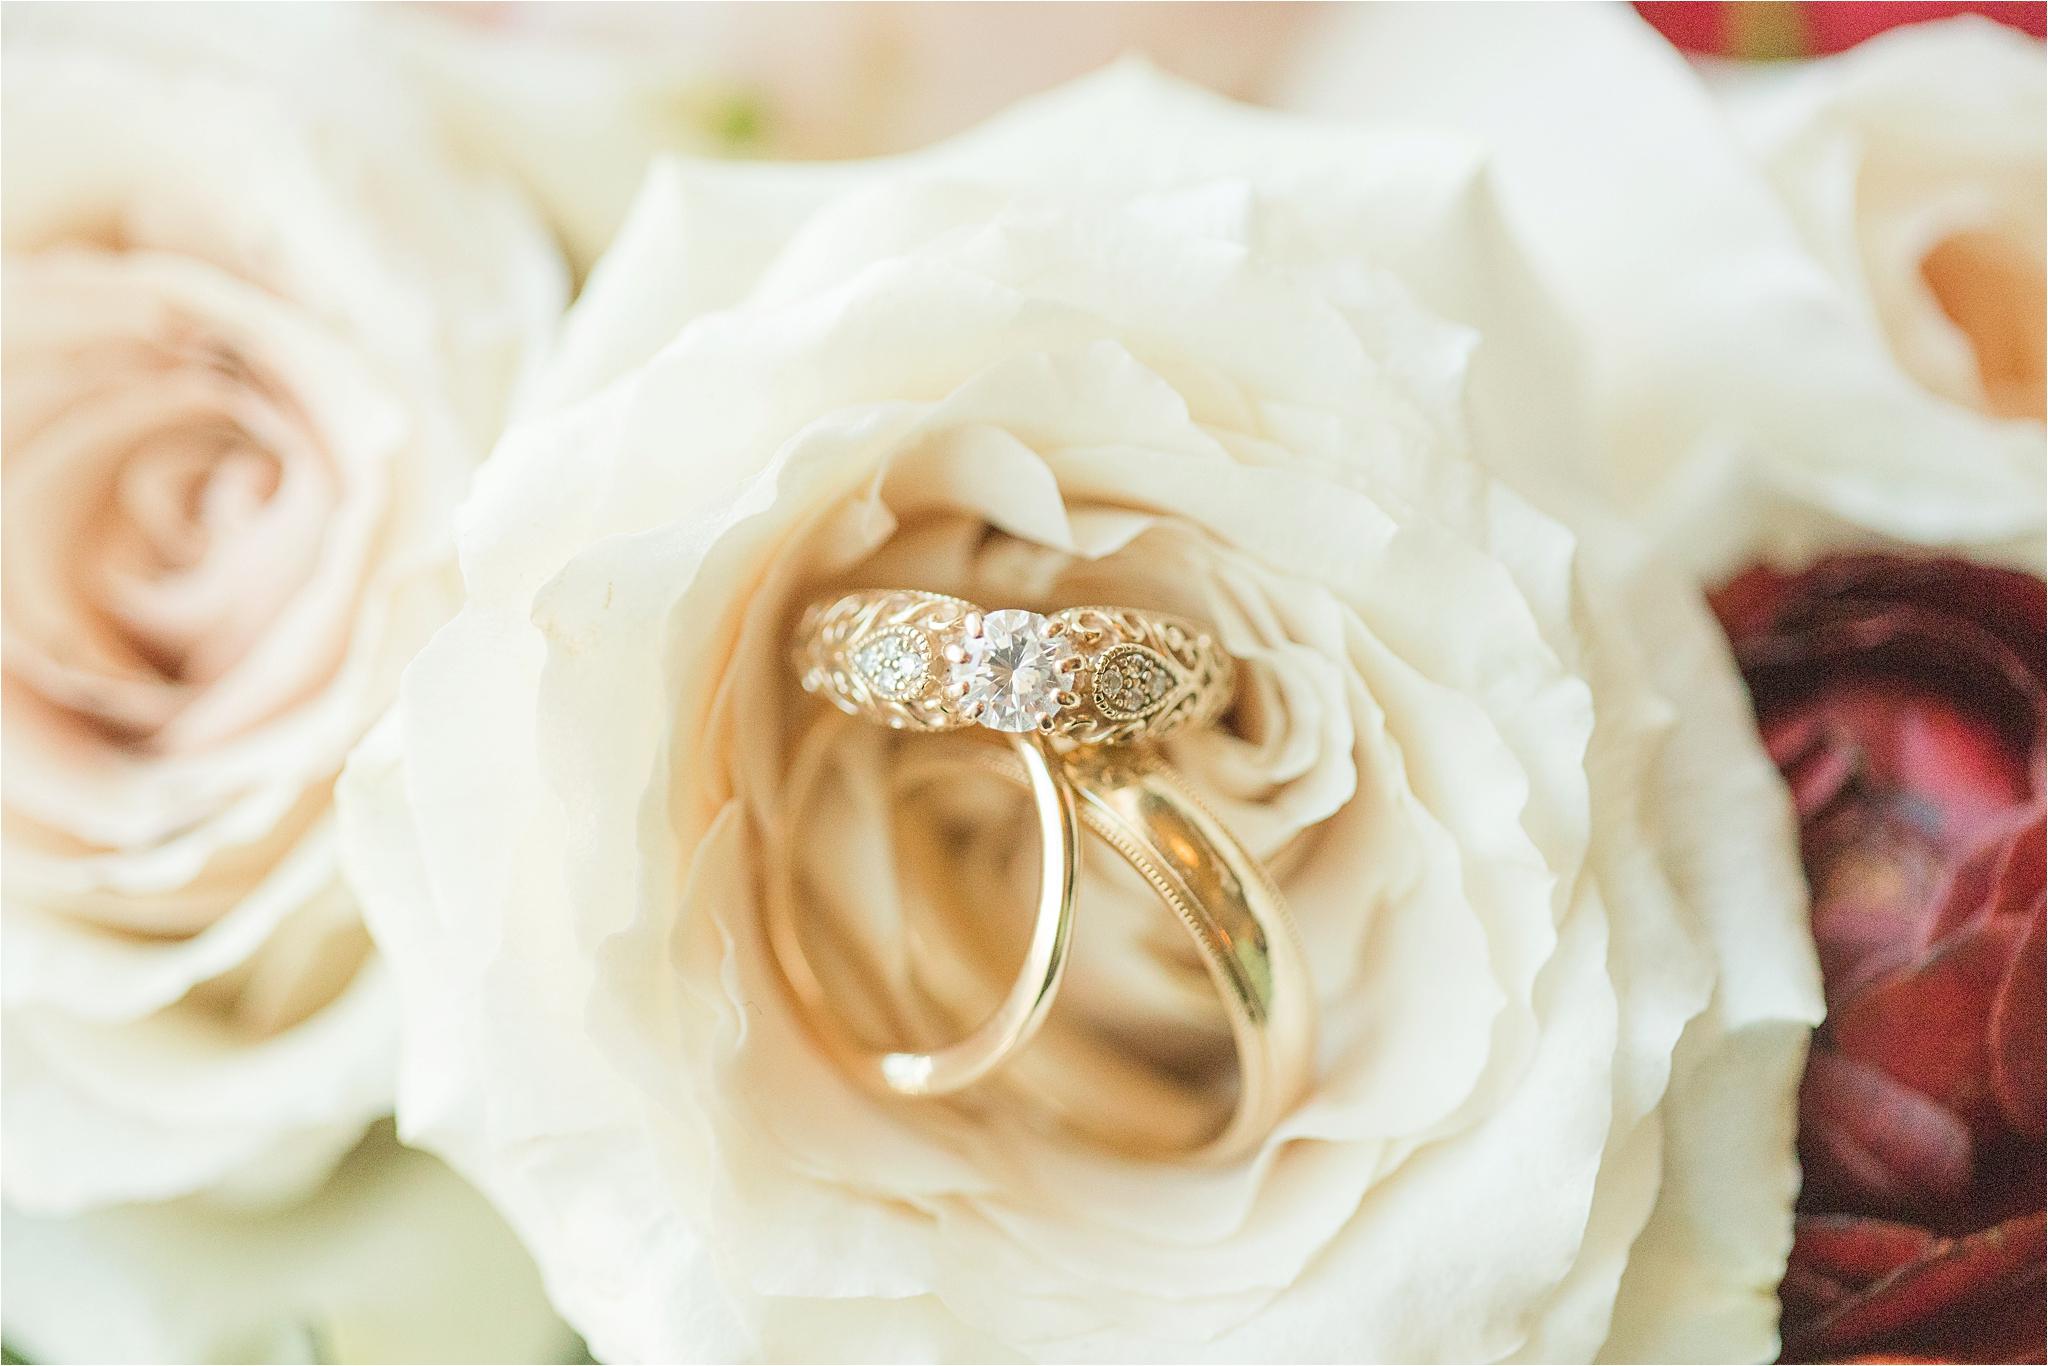 ornate-wedding-engagement-rings-yellow-gold-antique-unique-round-cut-diamond-vine-leaves